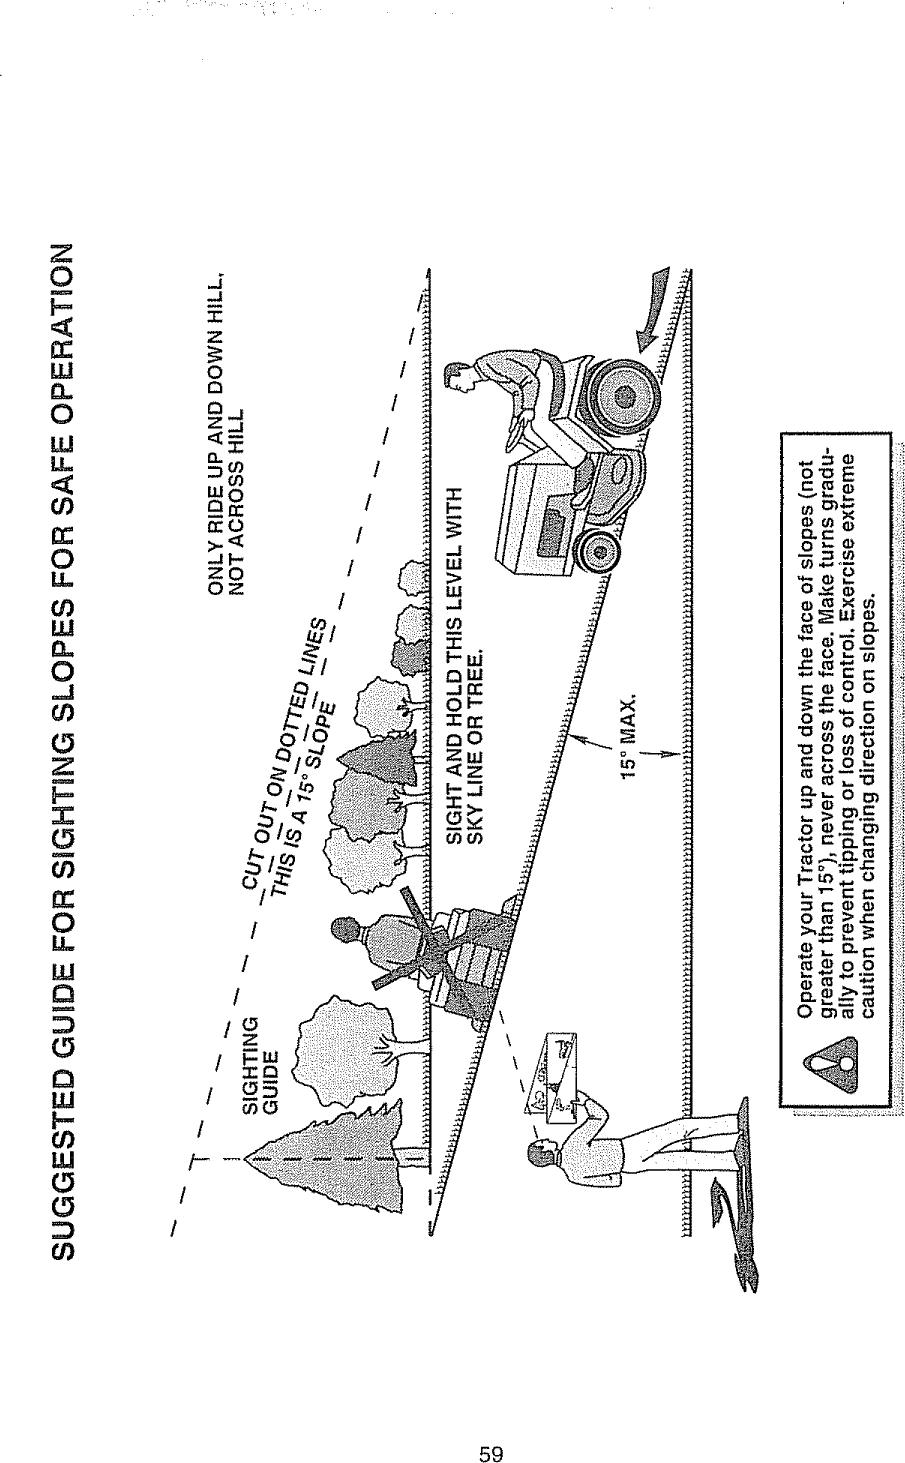 Magneto Schematic Diagram Thd on